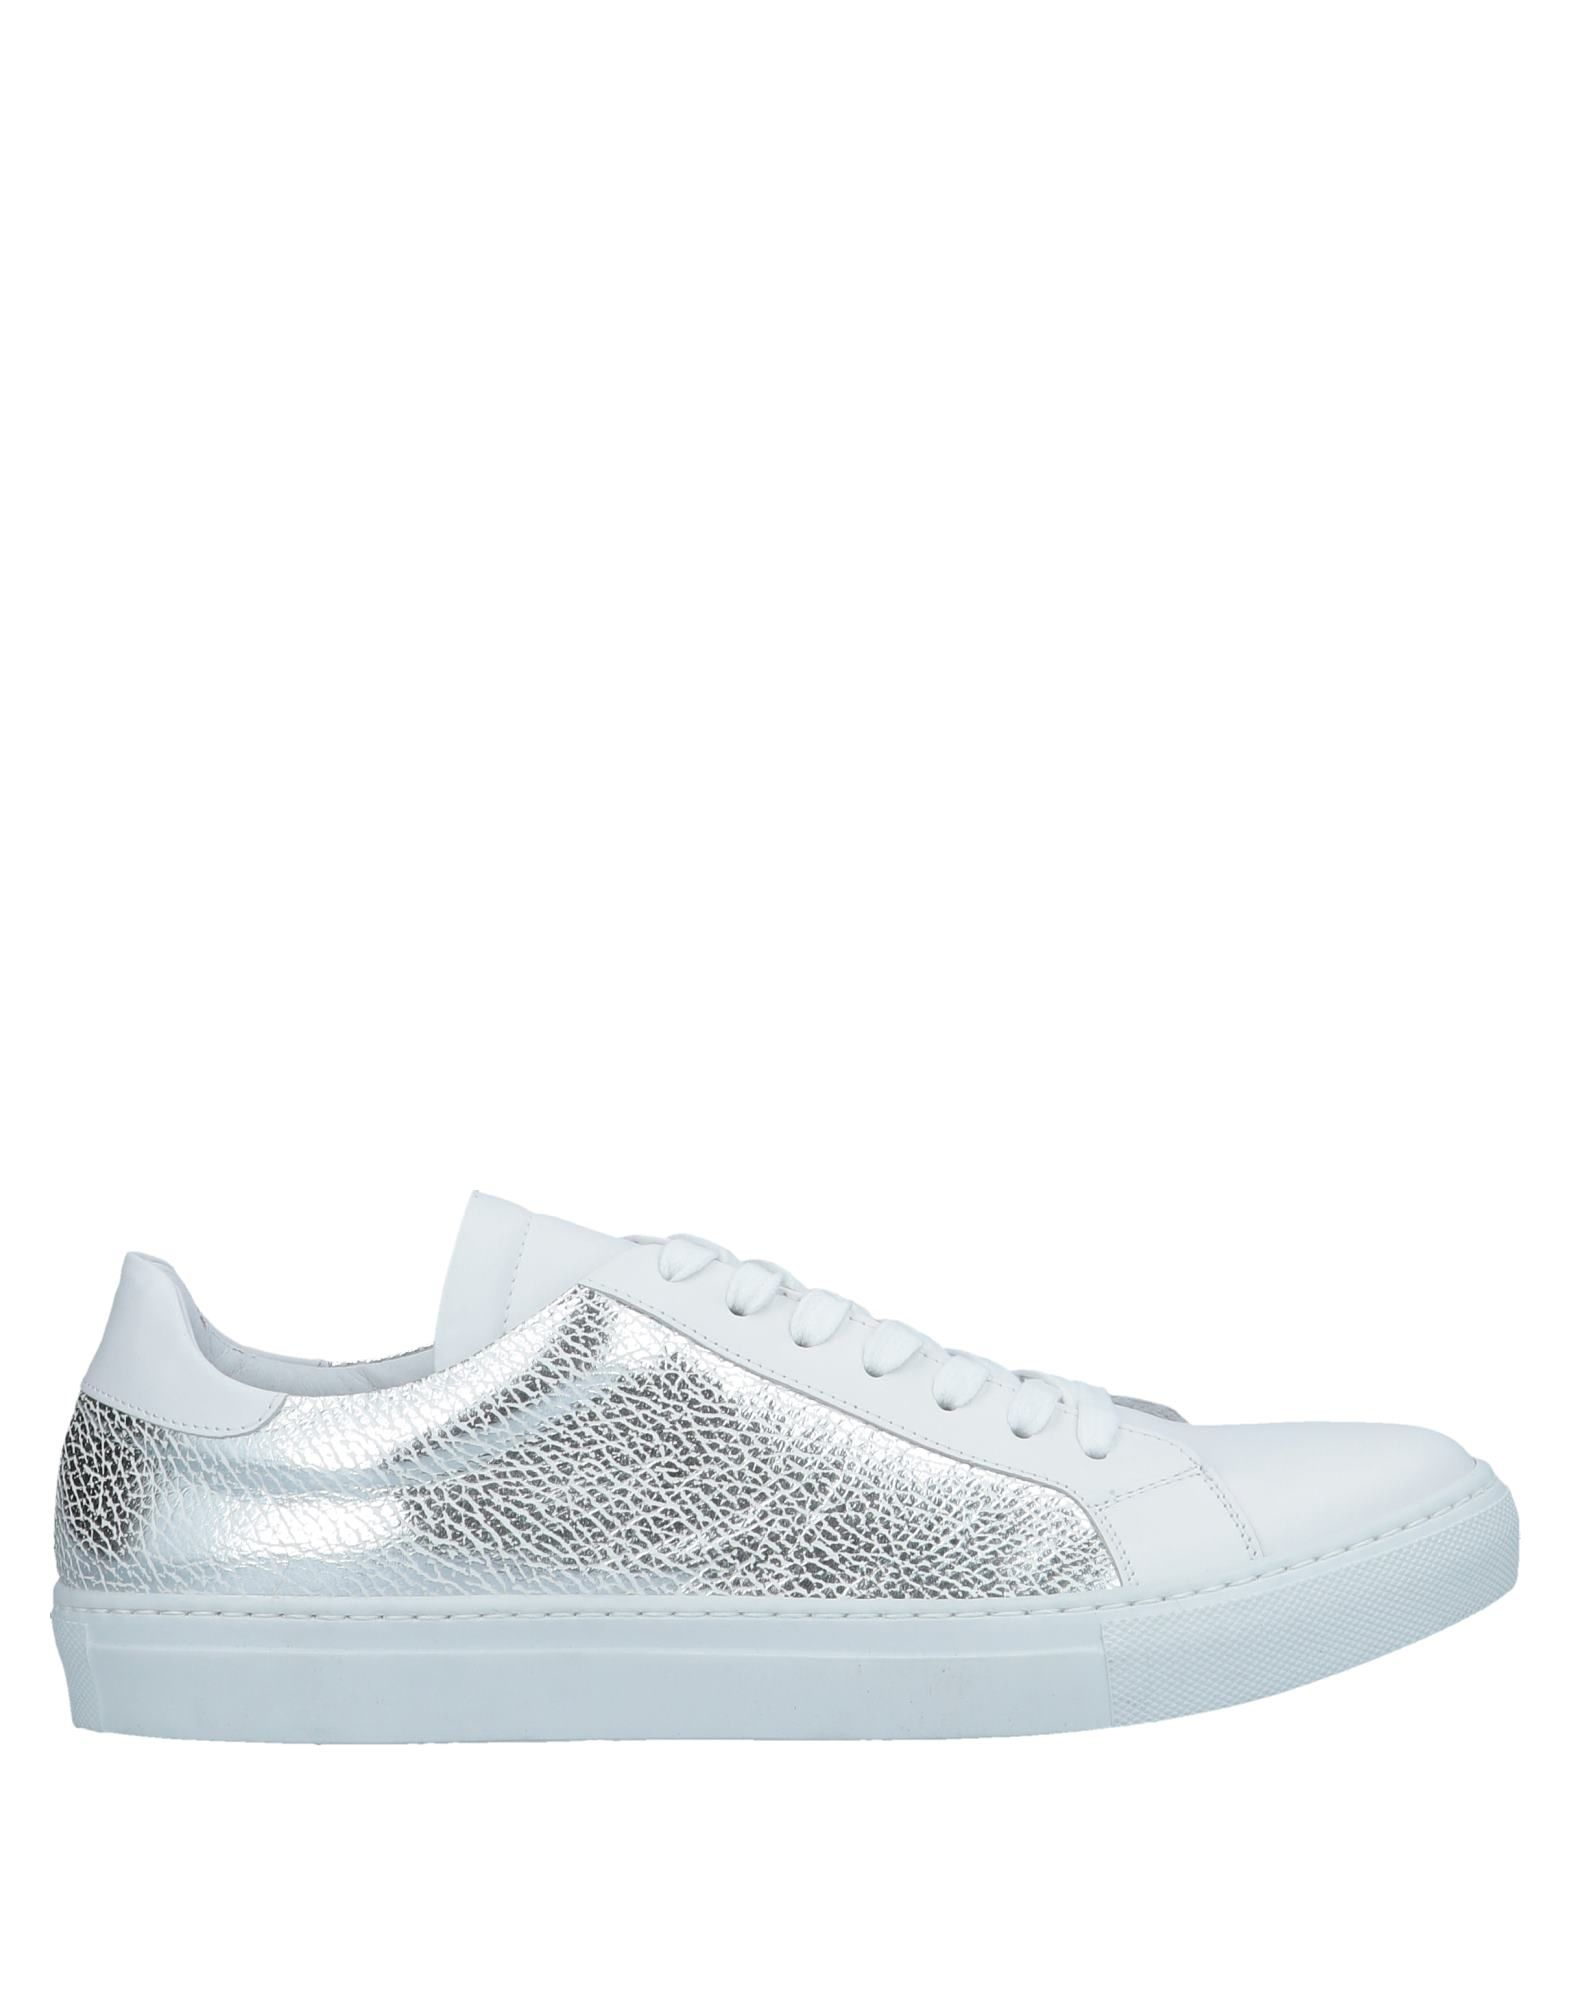 Tsd12 Sneakers Herren  11567472WI Gute Qualität beliebte Schuhe